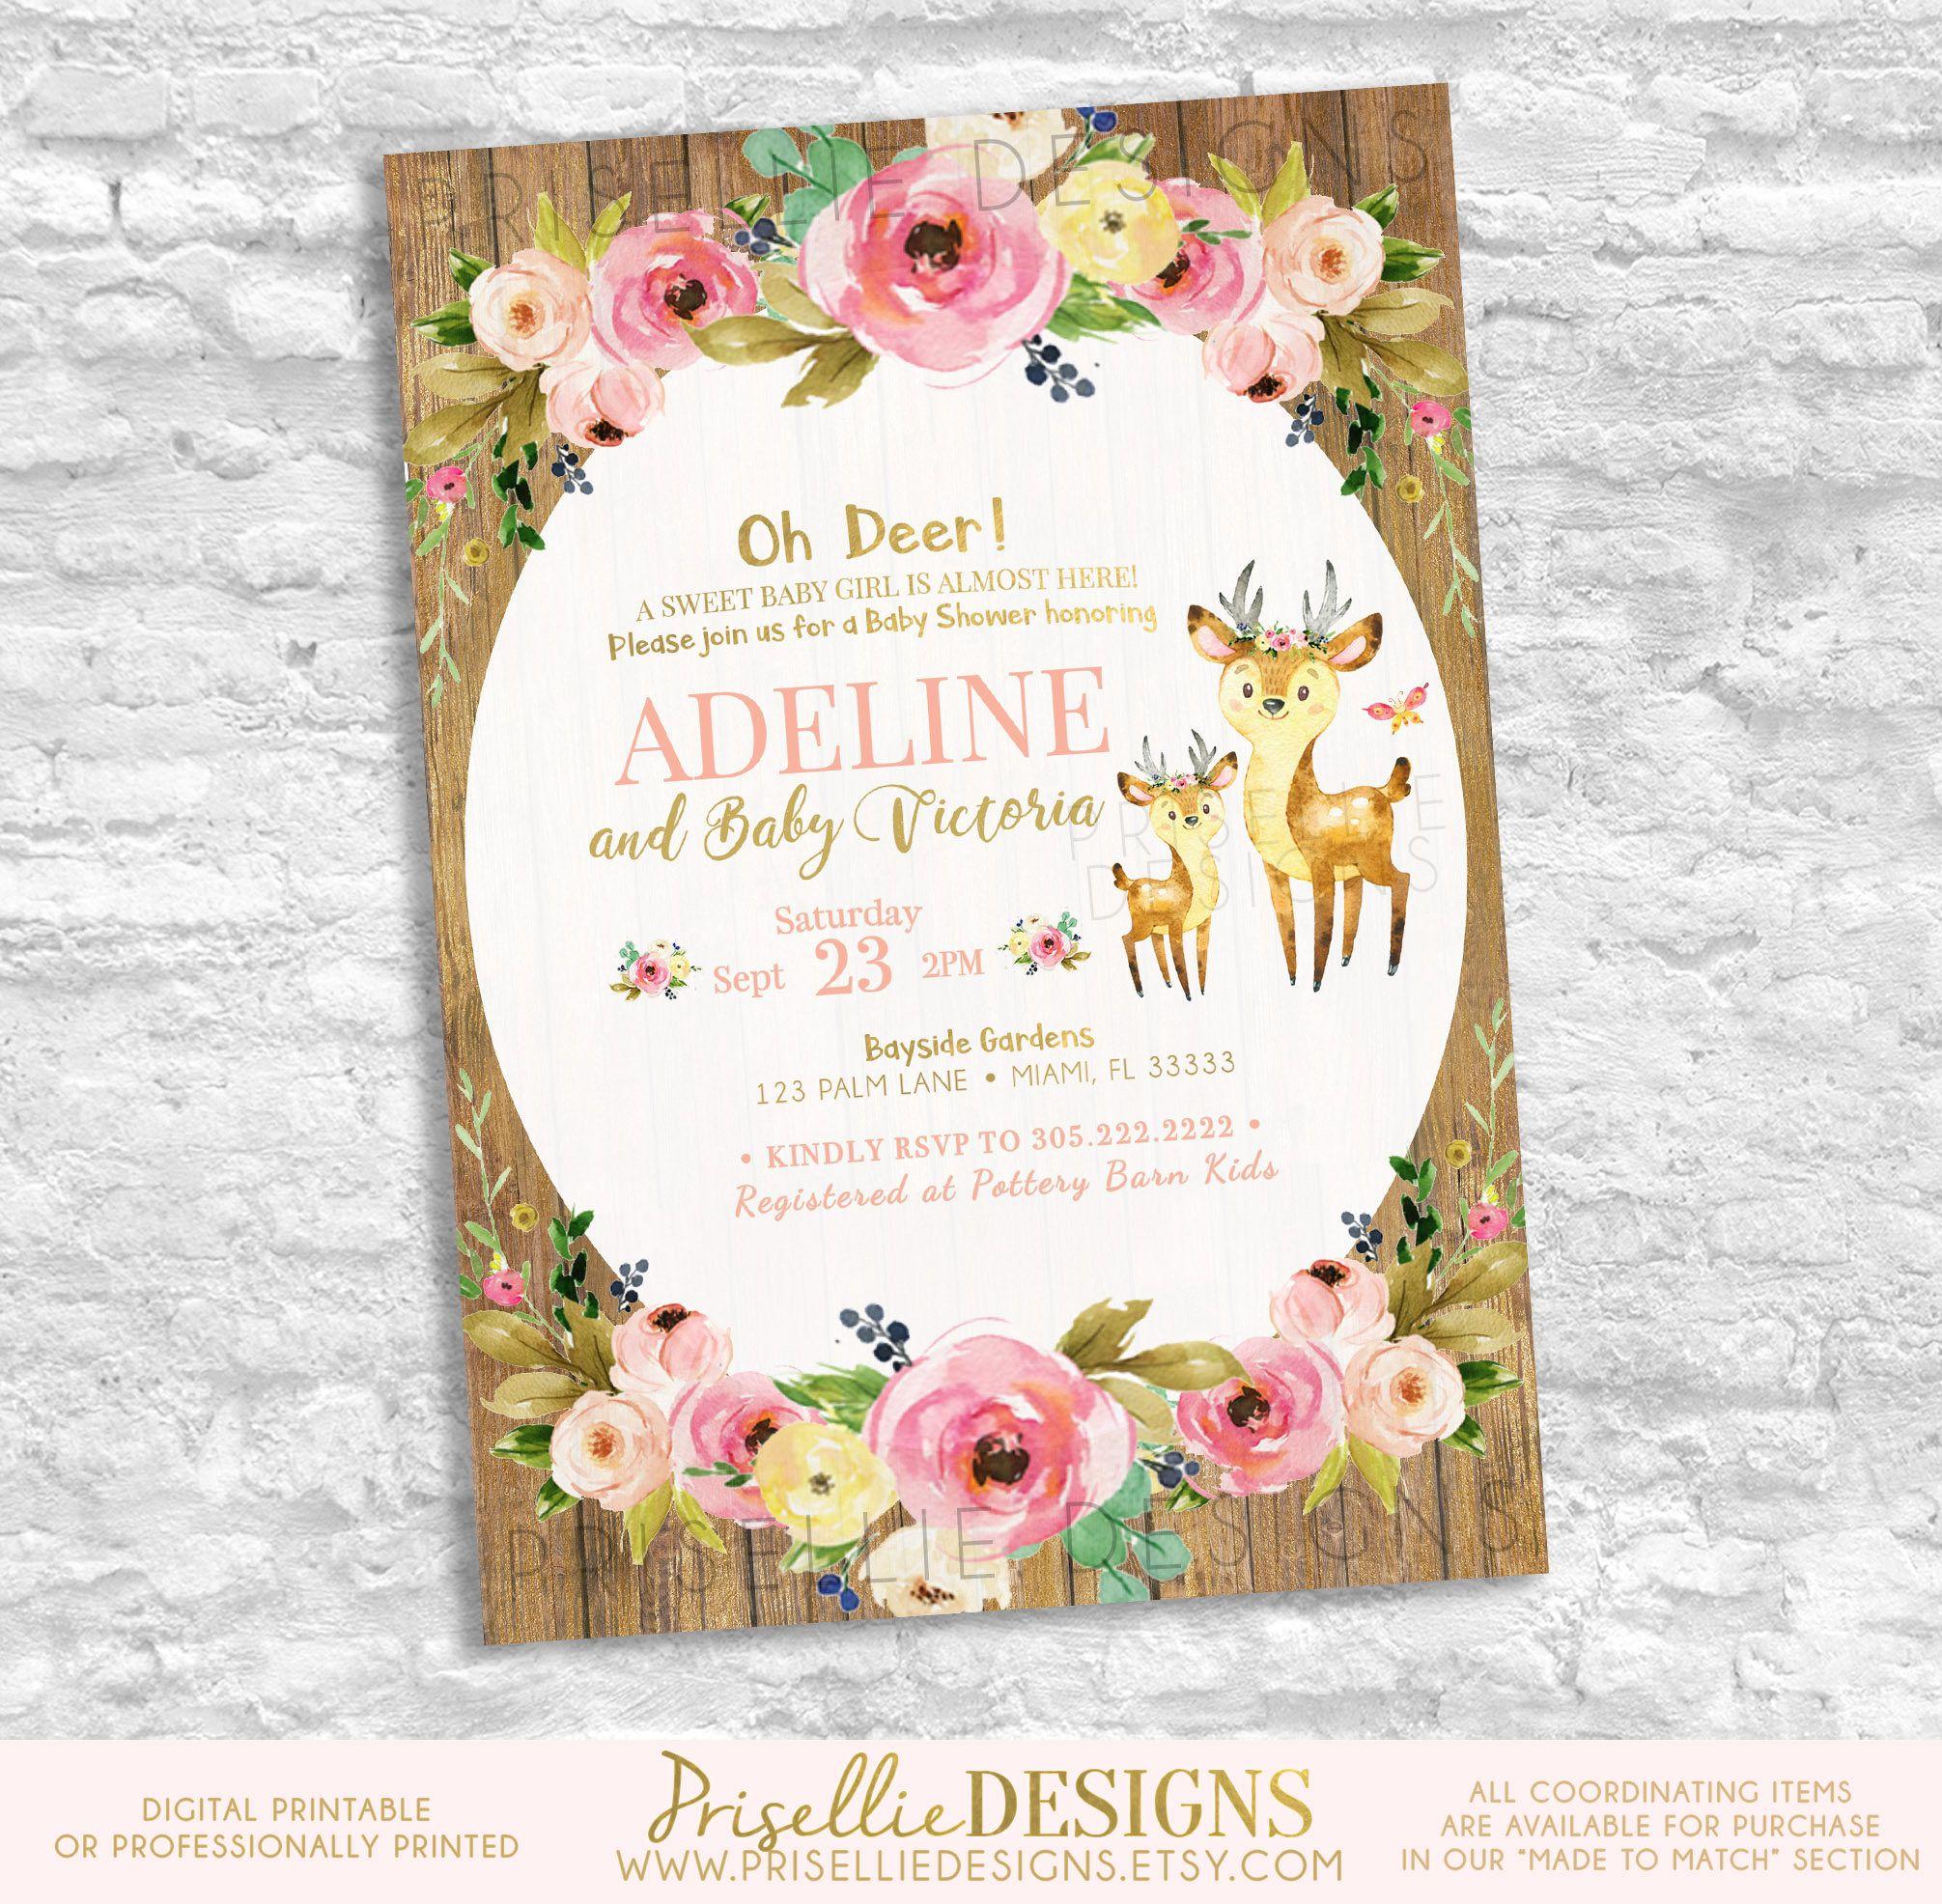 oliveandpinkfloralweddinginvitation shower bunny rectangle invitation co baskan flower invitations idai baby